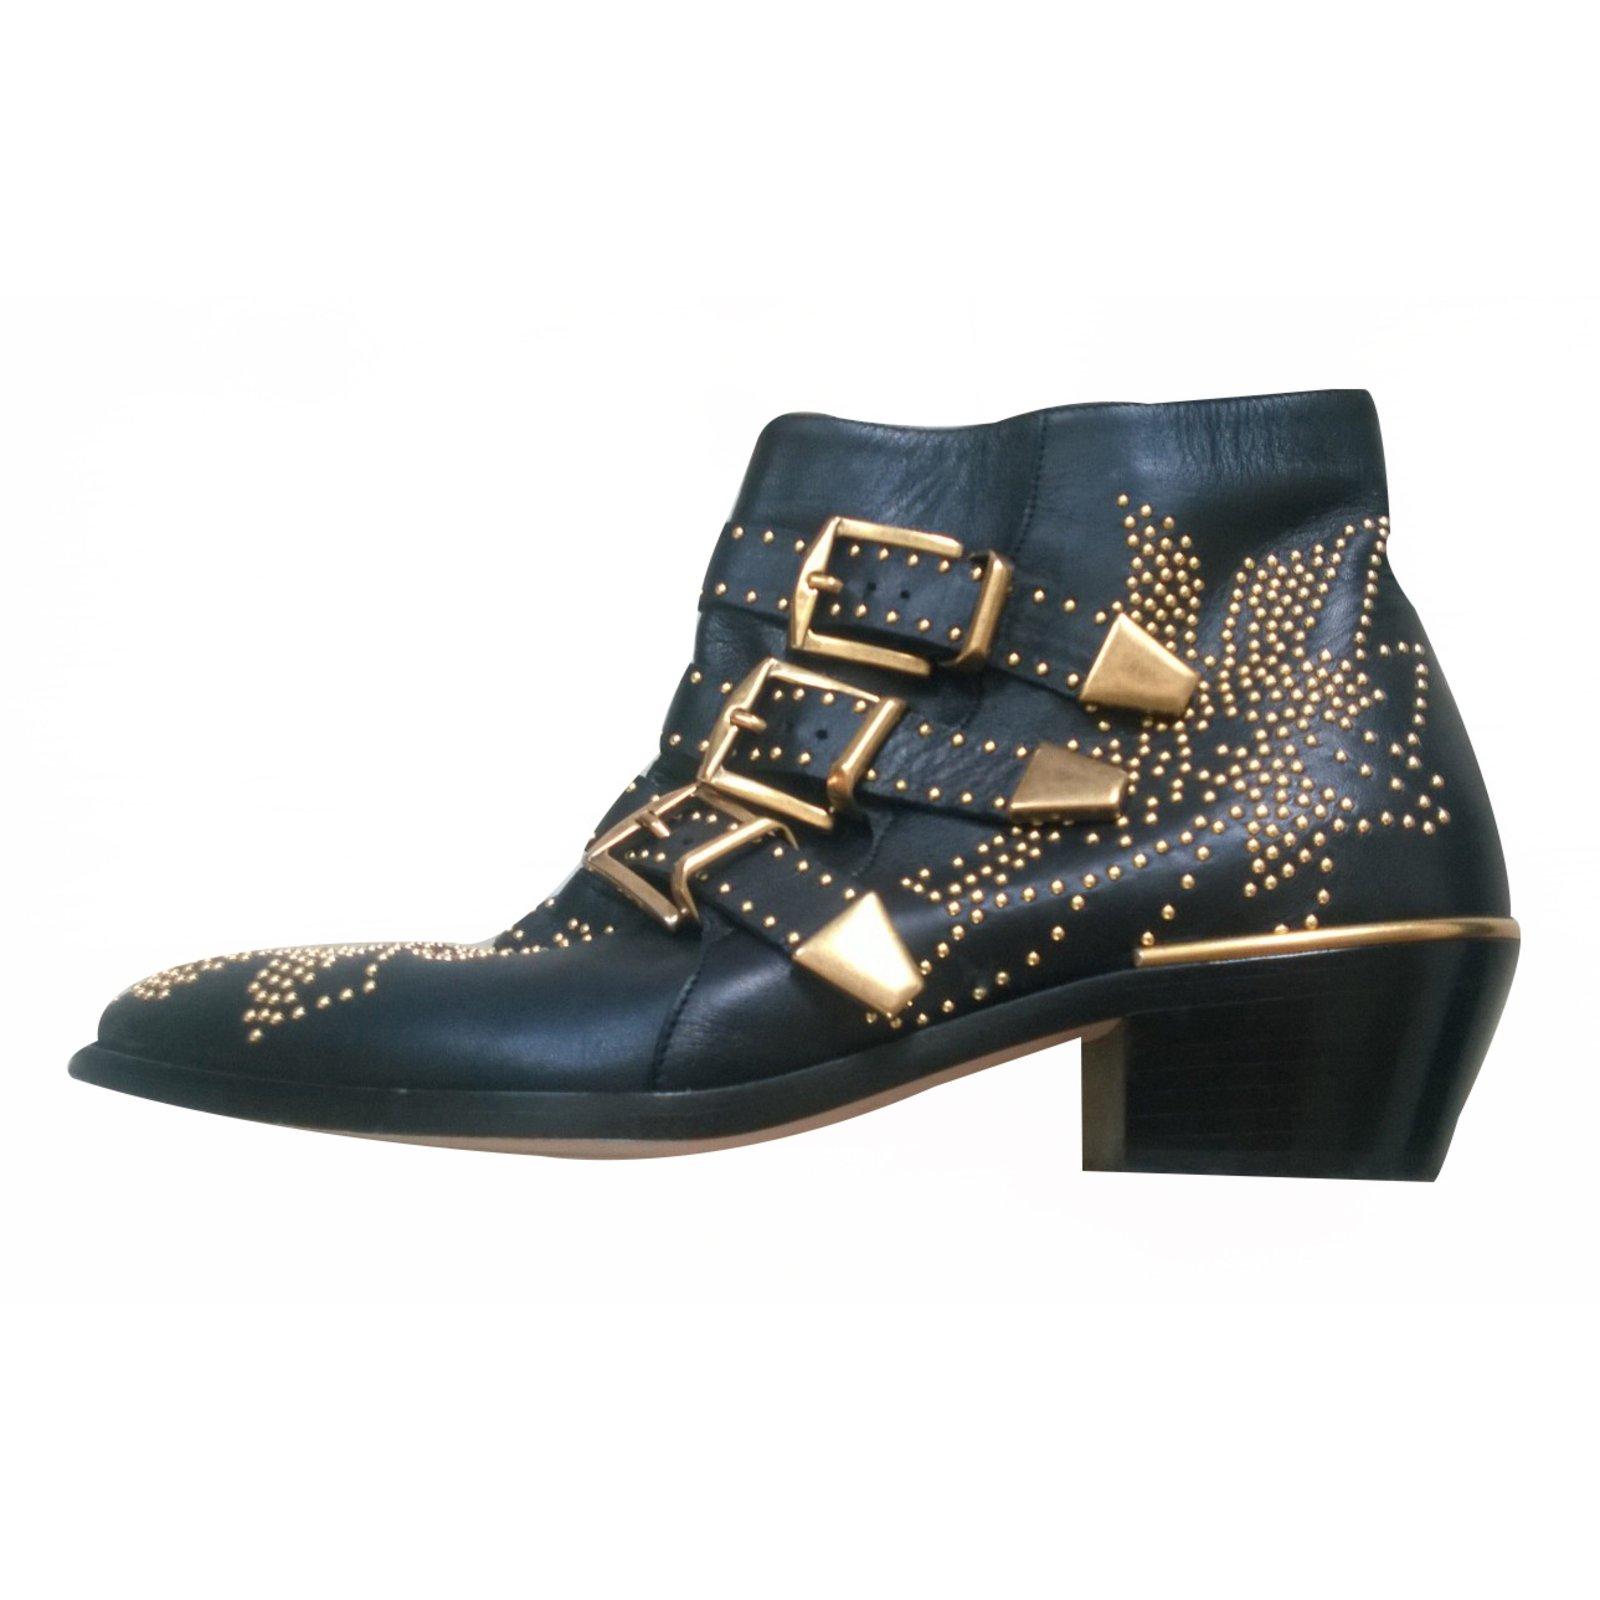 Chloé Susanna Ankle Boots Leather Black